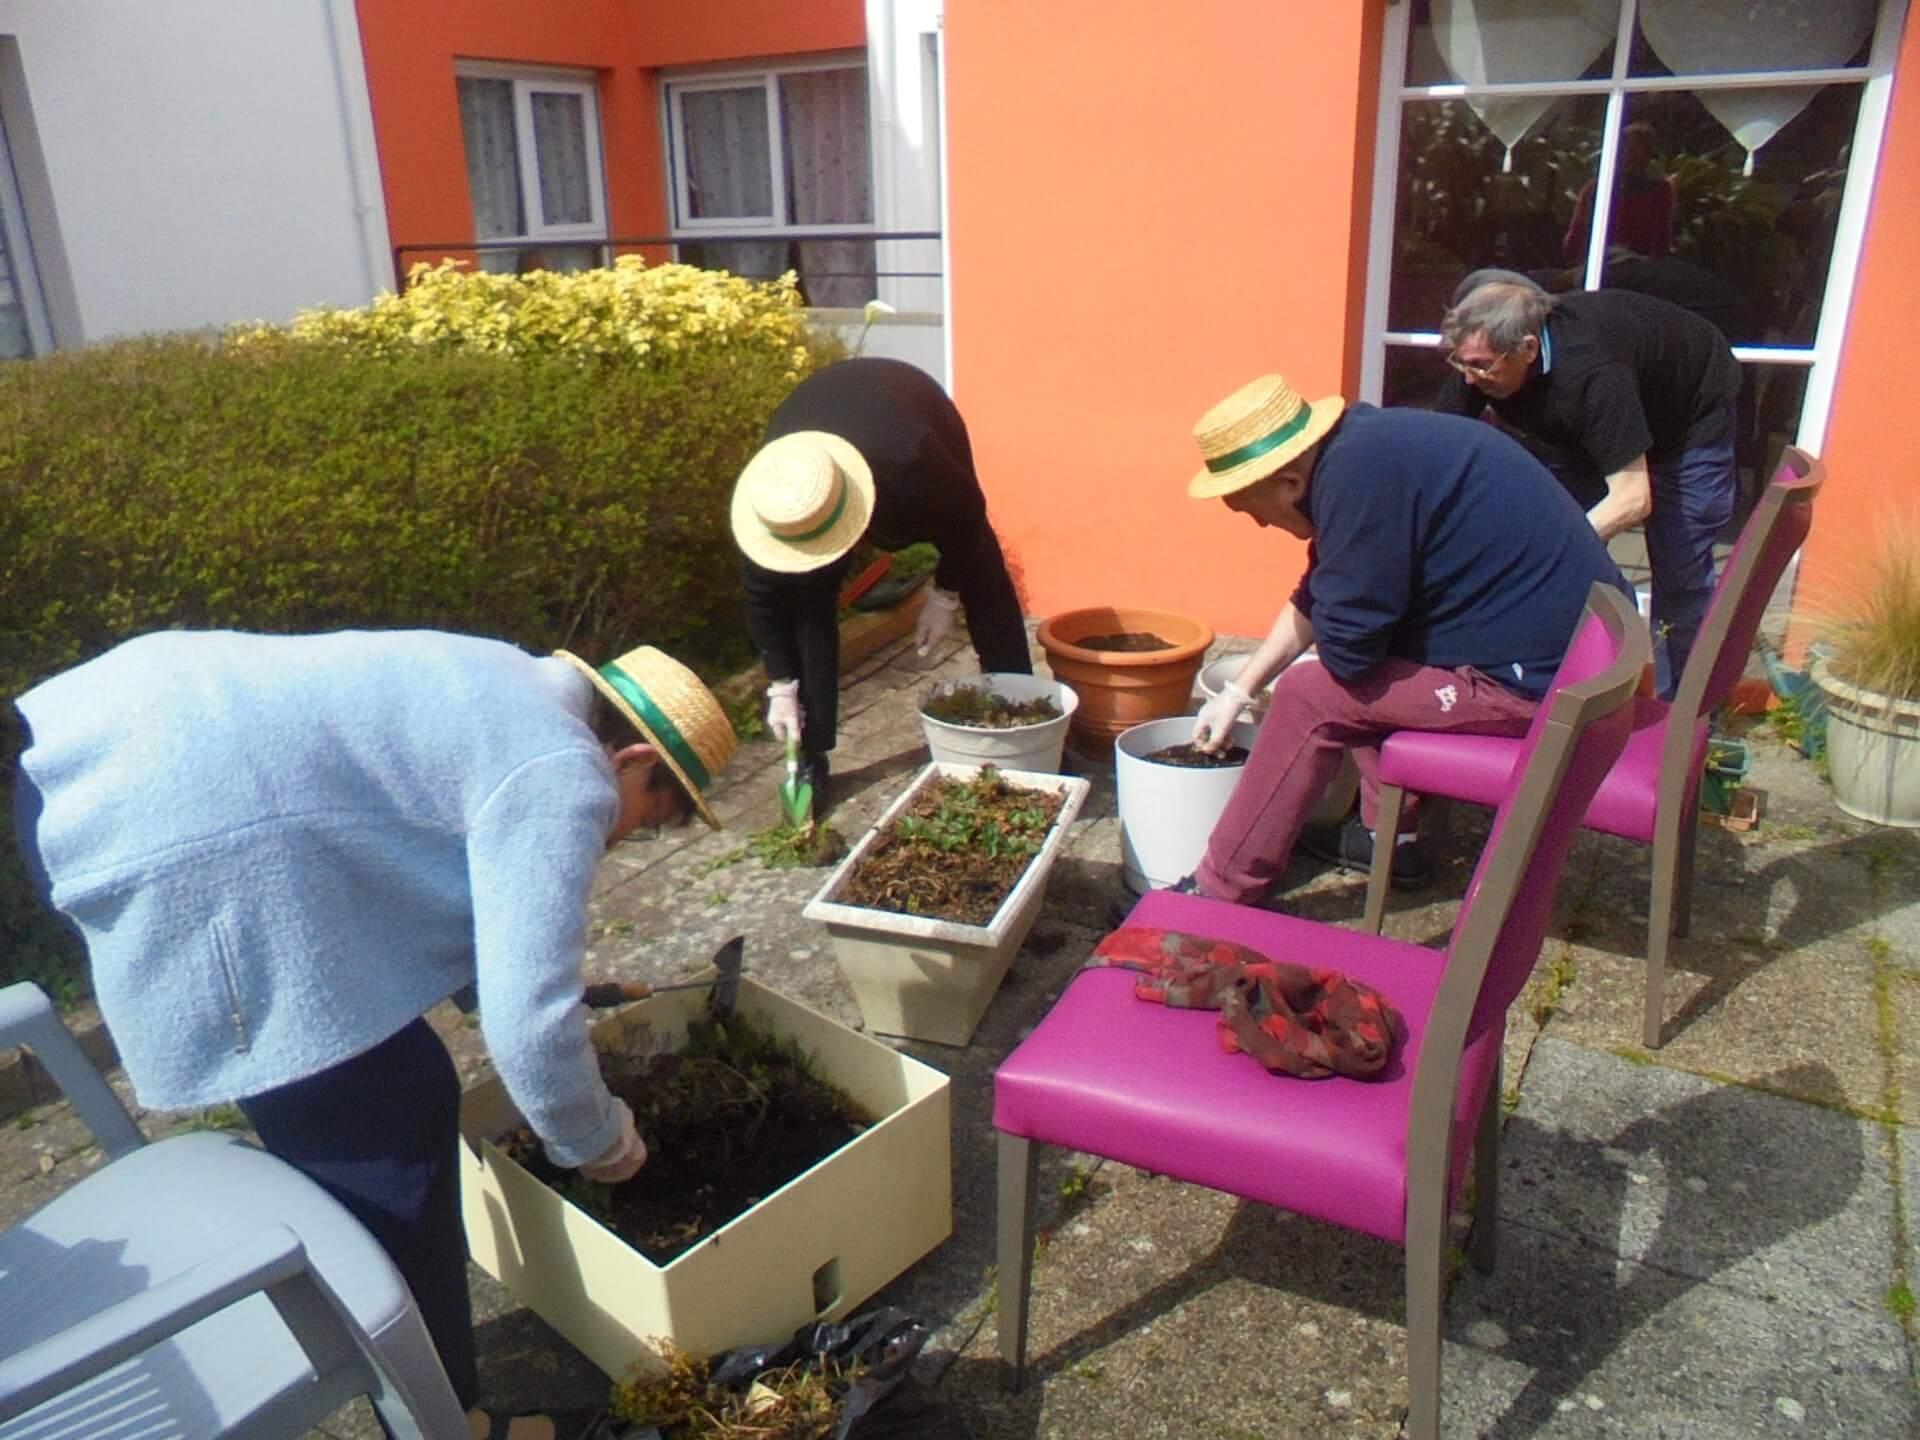 Jardinage - le 8 avril